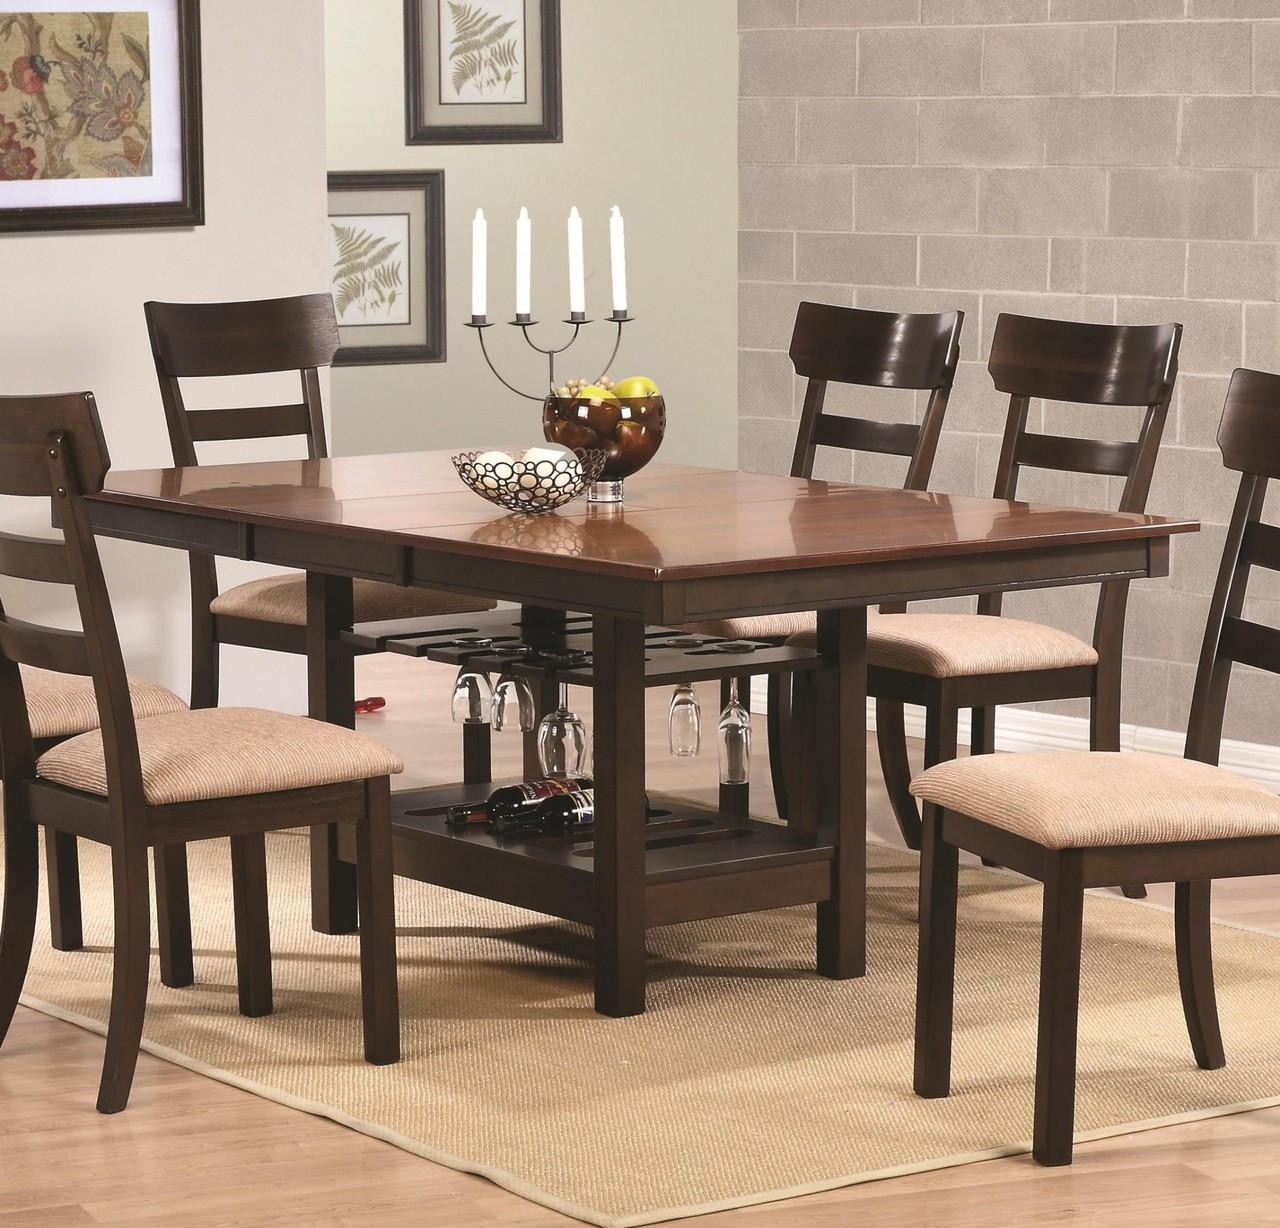 Diego Light Dark Walnut 7pc Dining Set Cb Furniture